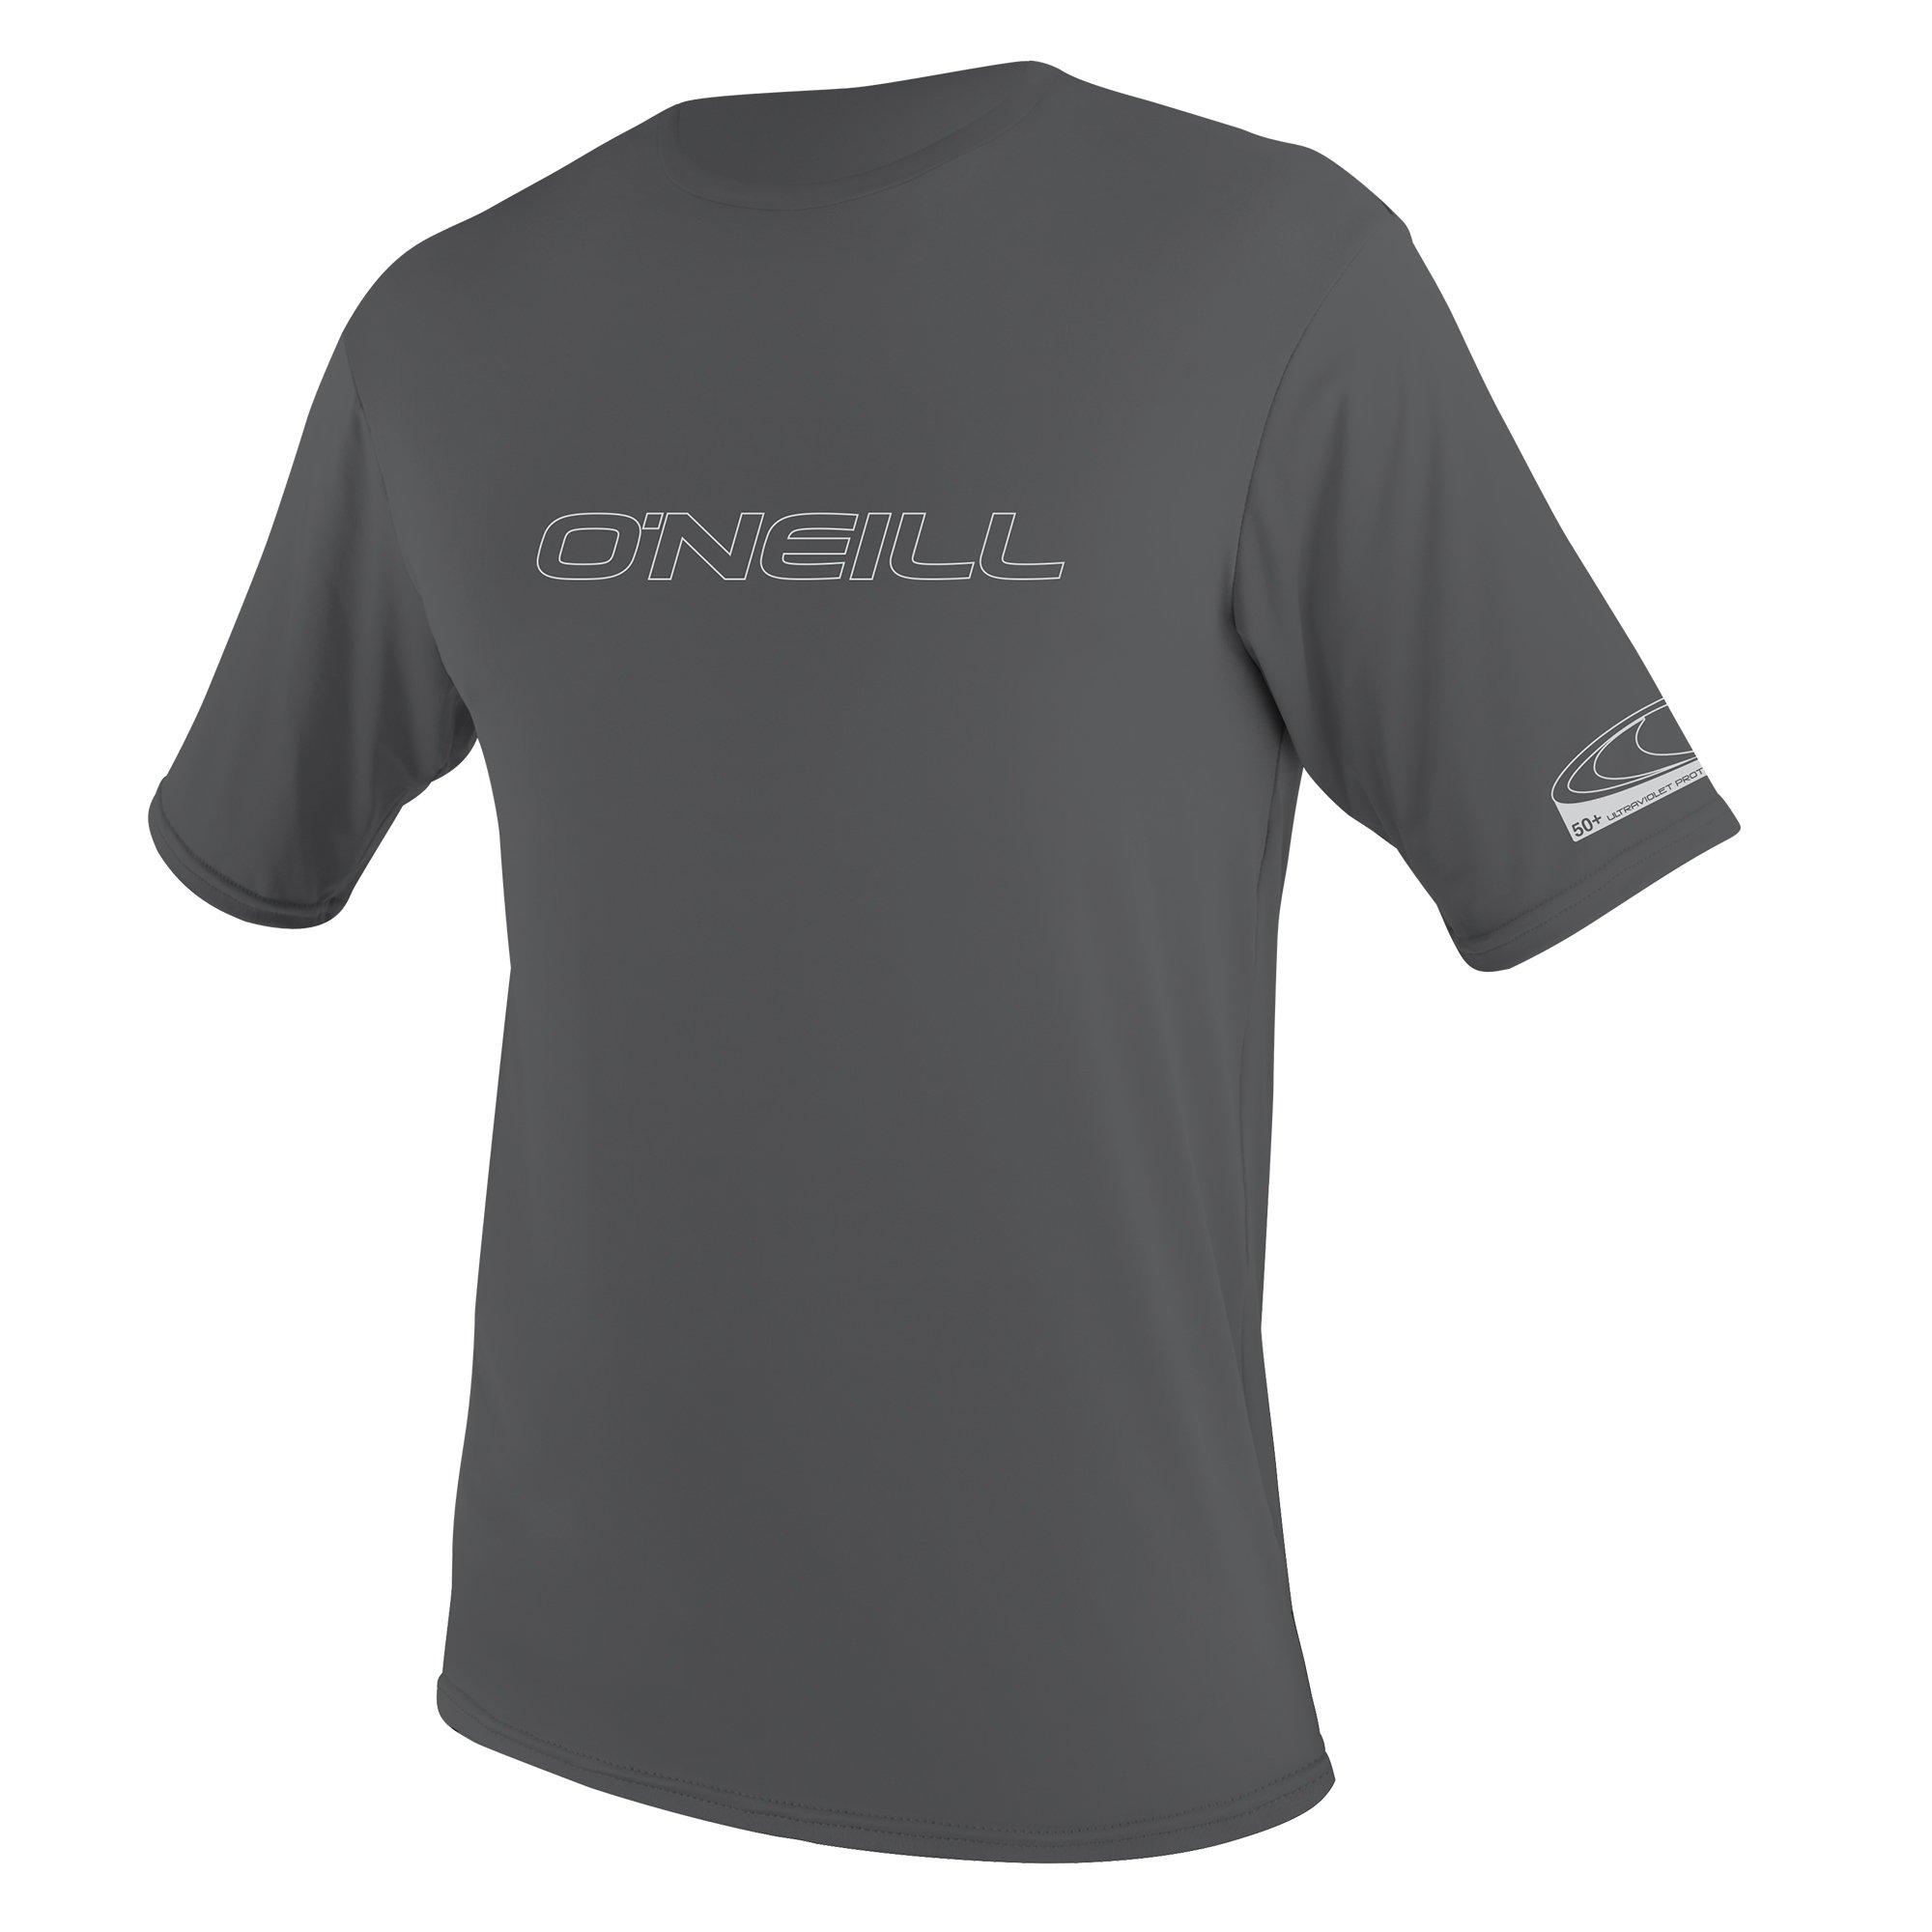 O'Neill Men's Basic Skins UPF 50+ Short Sleeve Sun Shirt, Smoke, Small by O'Neill Wetsuits